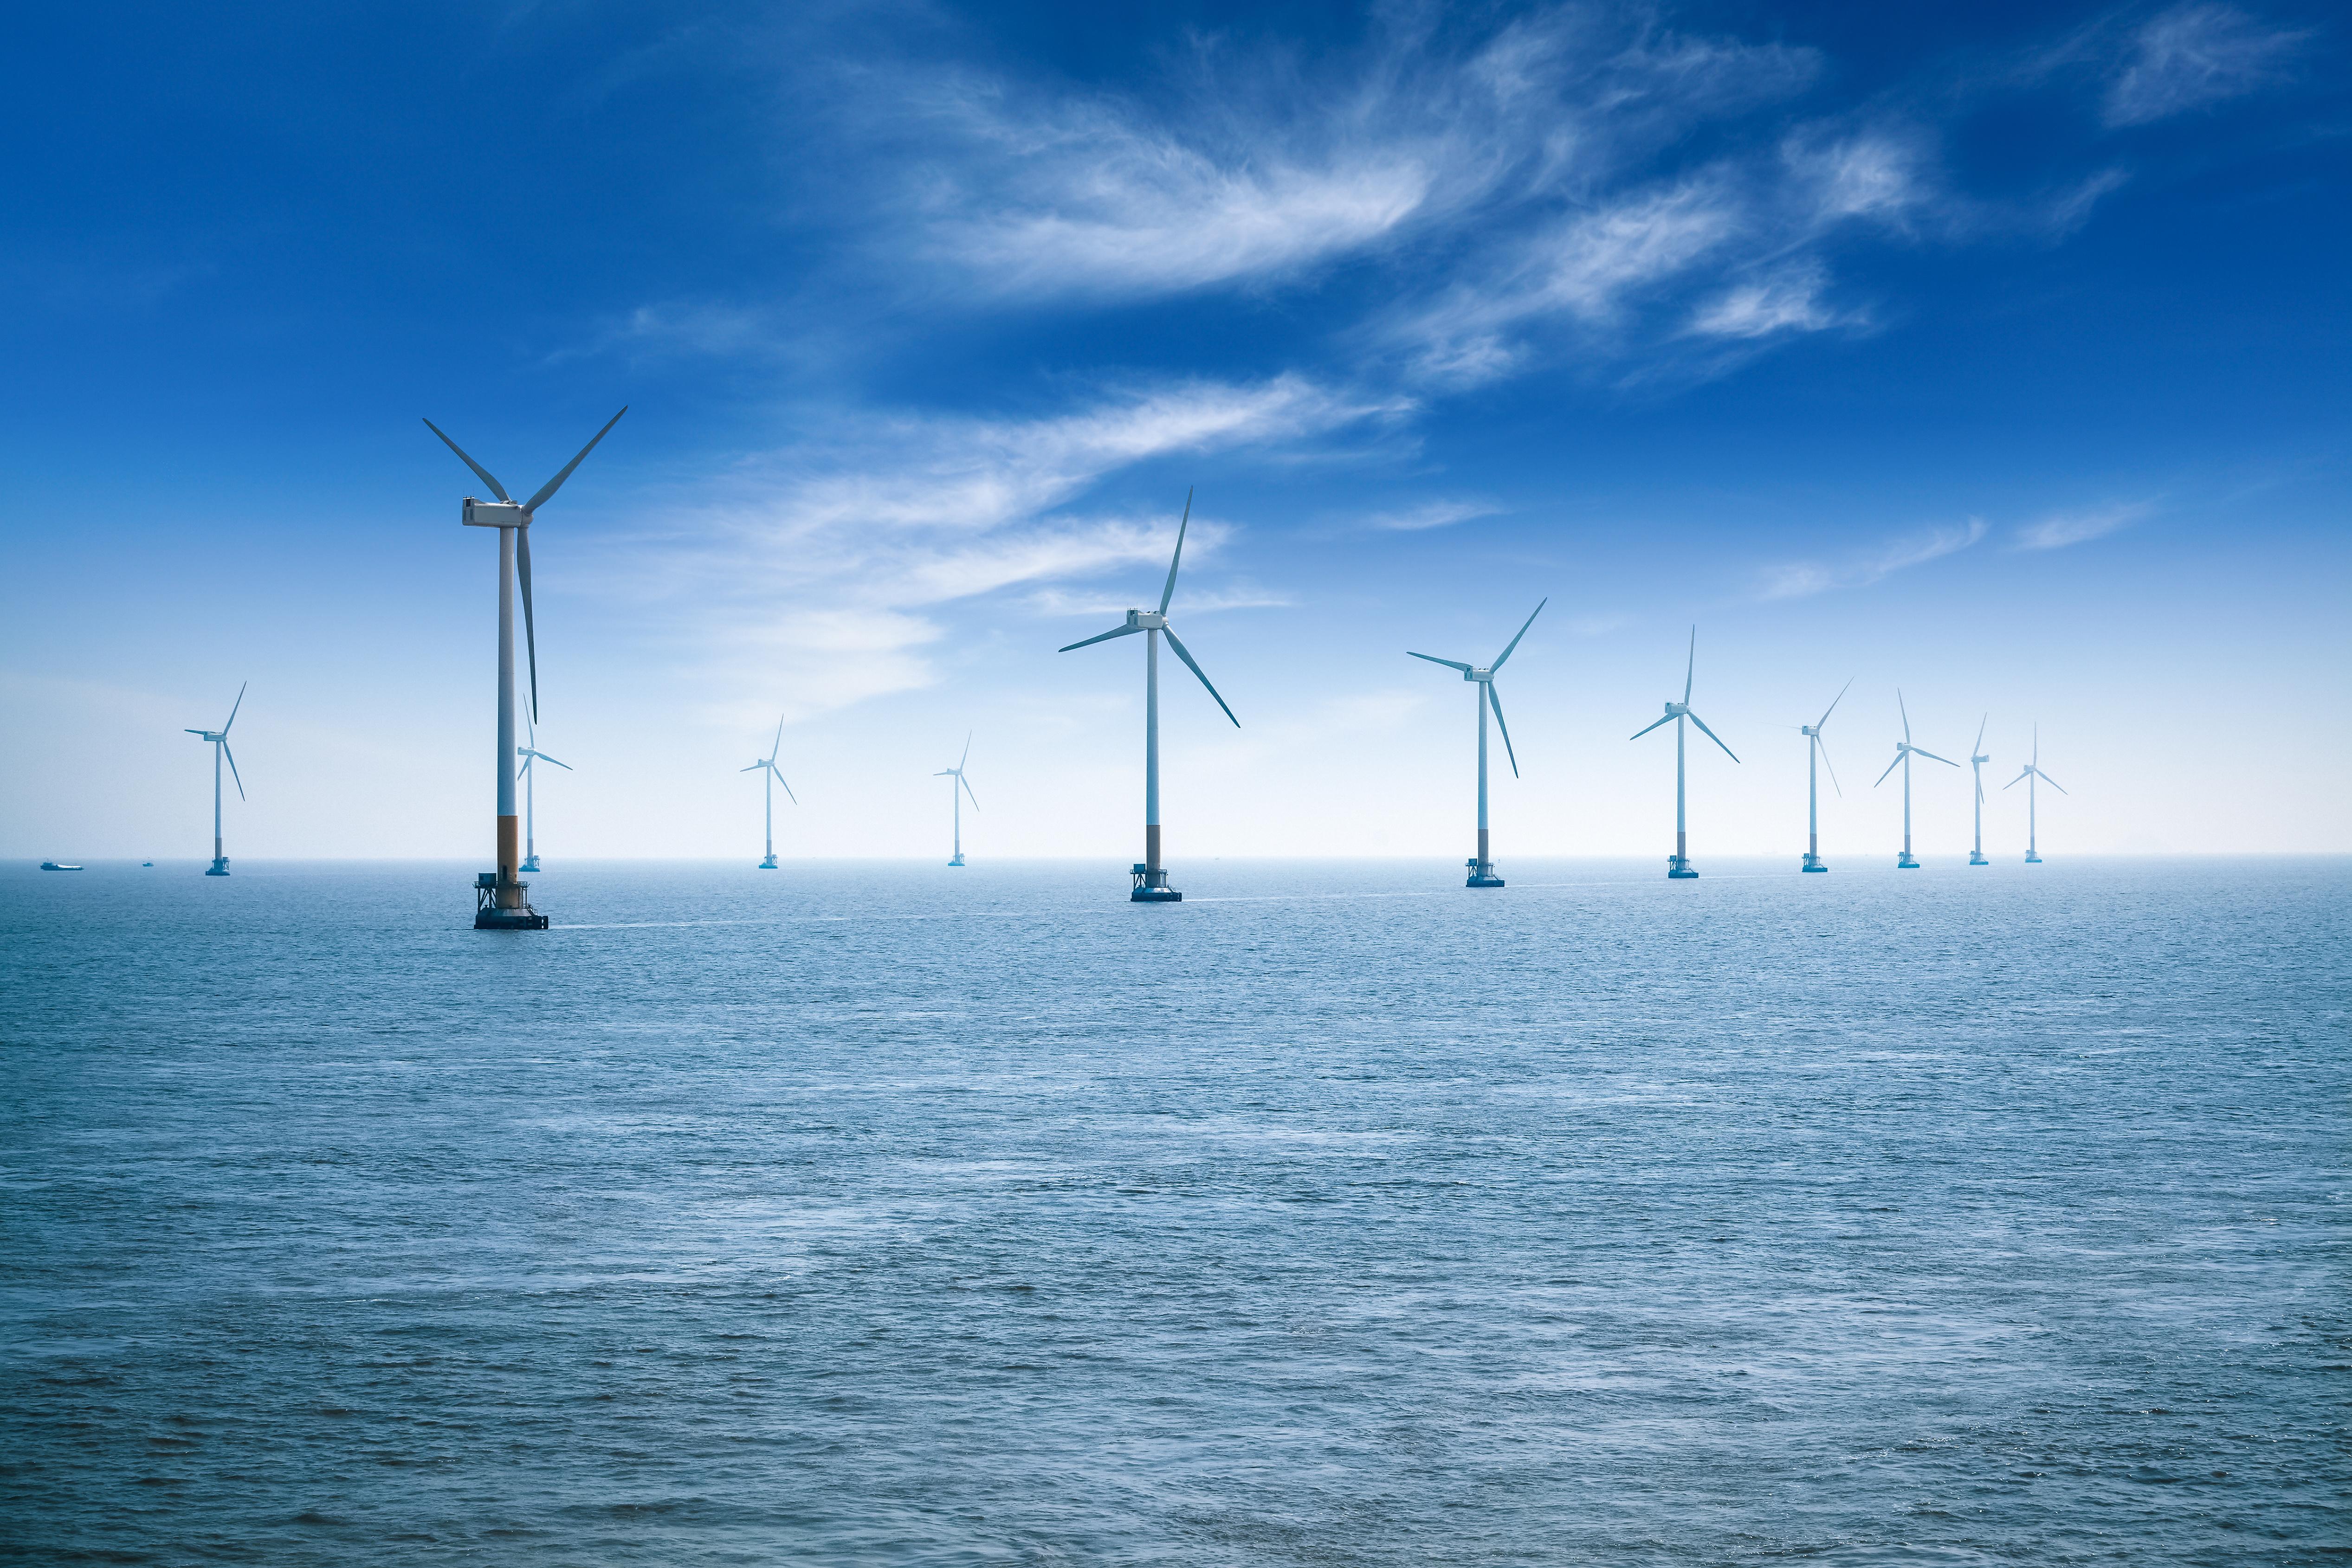 offshore wind farm the east China sea. Image courtesy of DollarPhotoClub.com